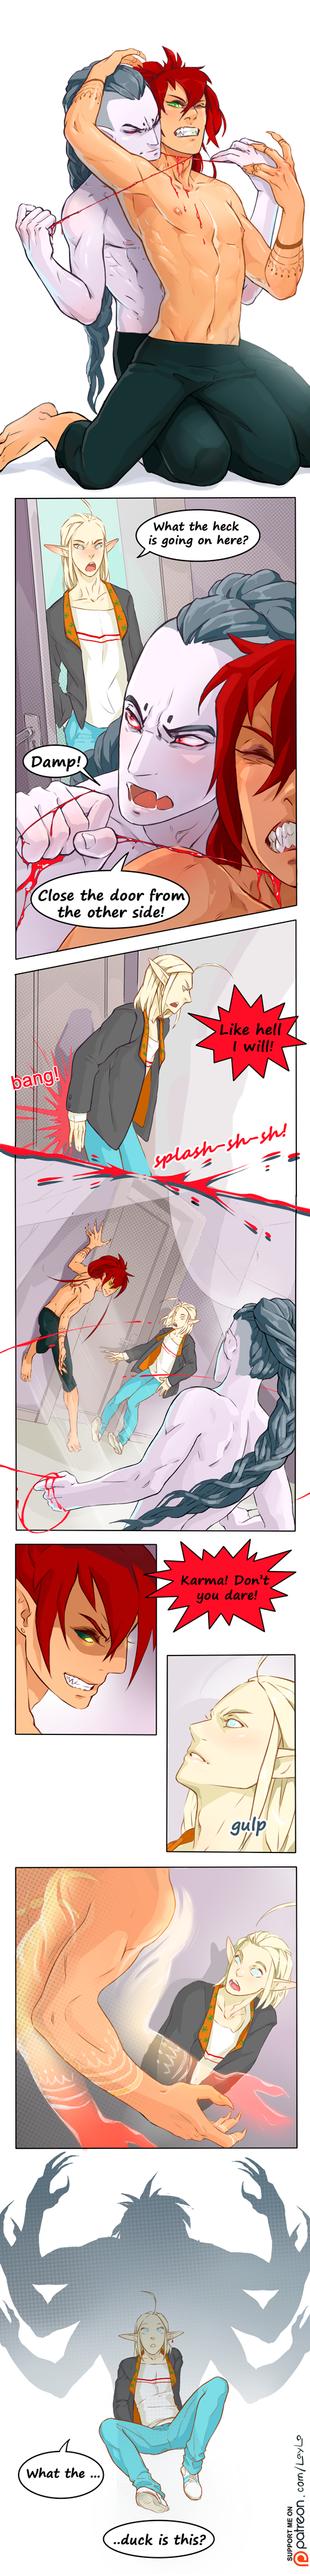 Page 44 by LayLoL